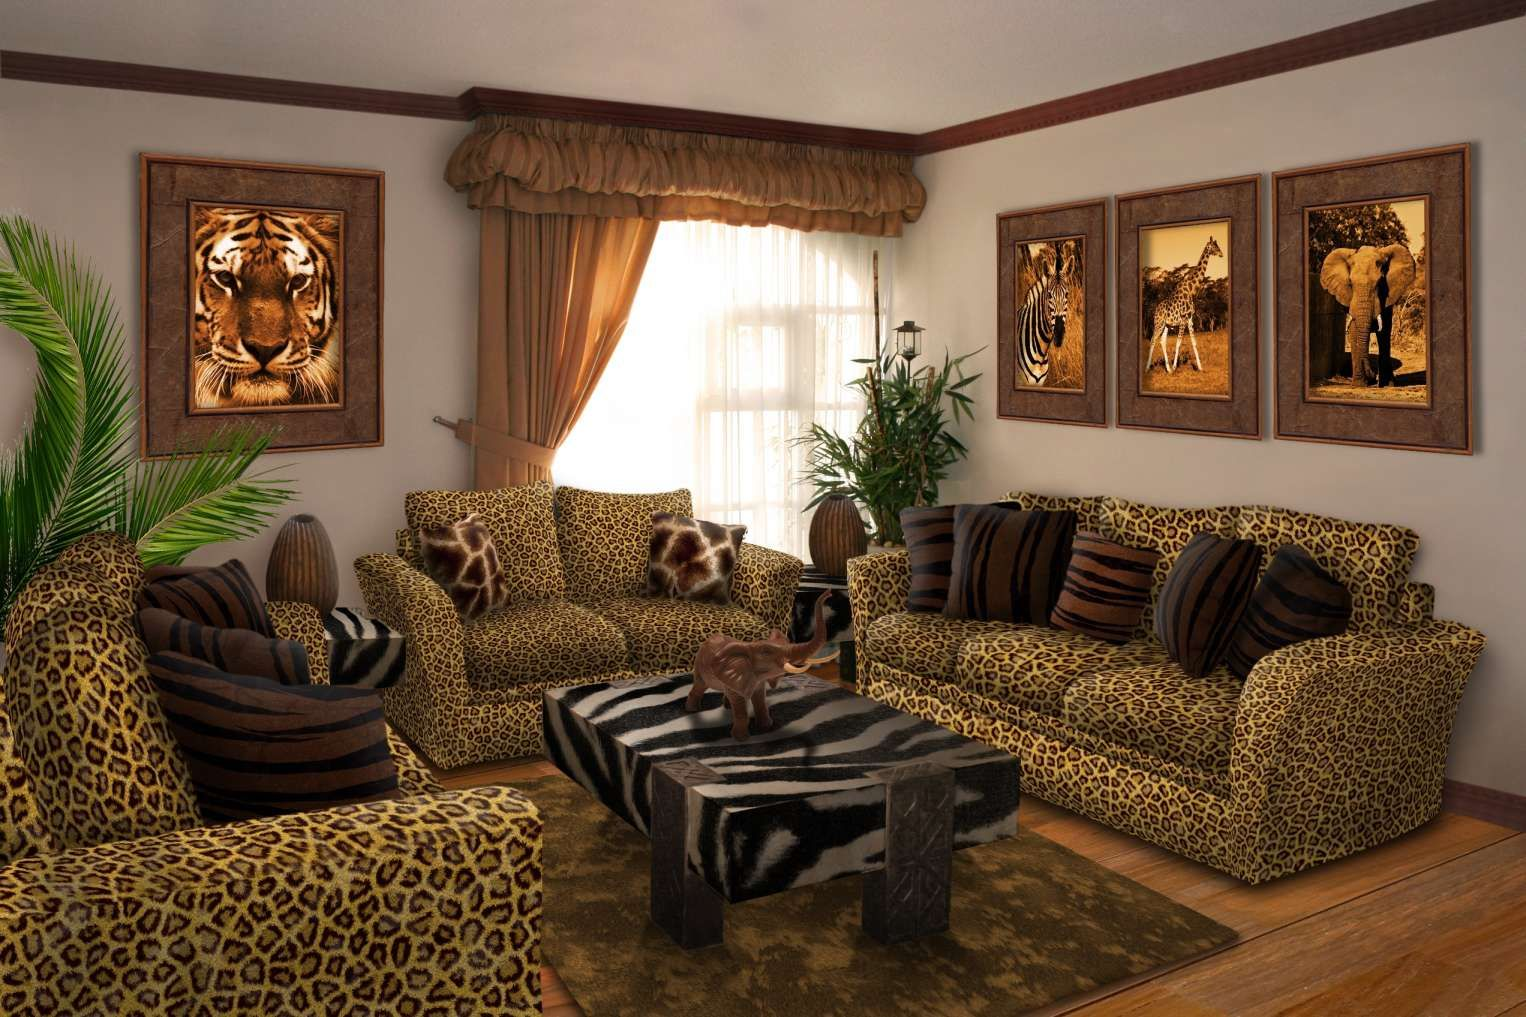 15 Excellent Animal Print Living Room Set Collection Living Room Alexstewartperu Com Safari Living Rooms African Living Rooms African Themed Living Room